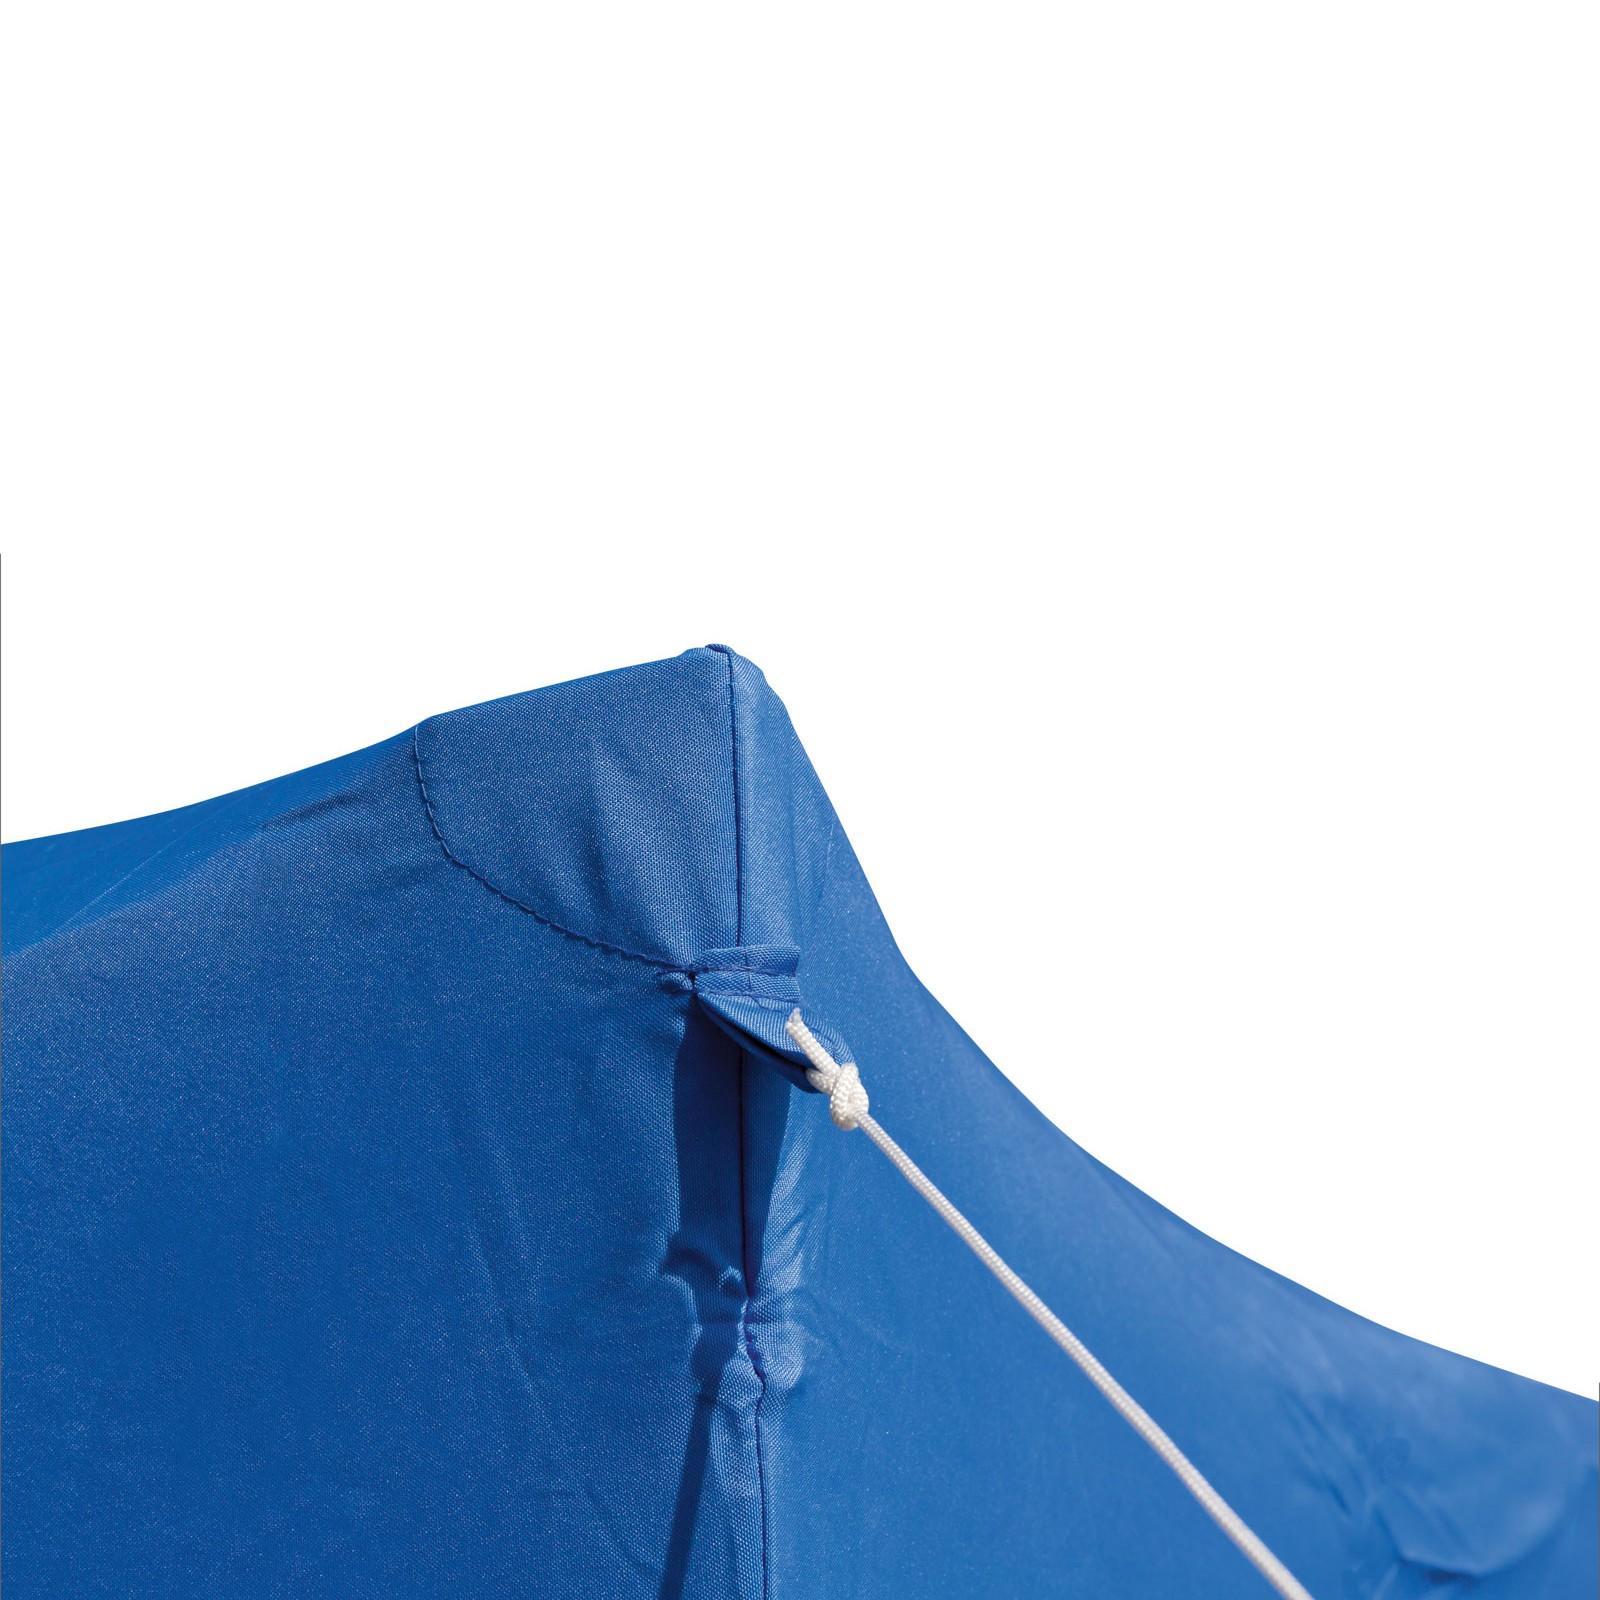 gartenpavillon faltpavillon alu metall 3x3 meter hellblau gartenzelt partyzelt ebay. Black Bedroom Furniture Sets. Home Design Ideas